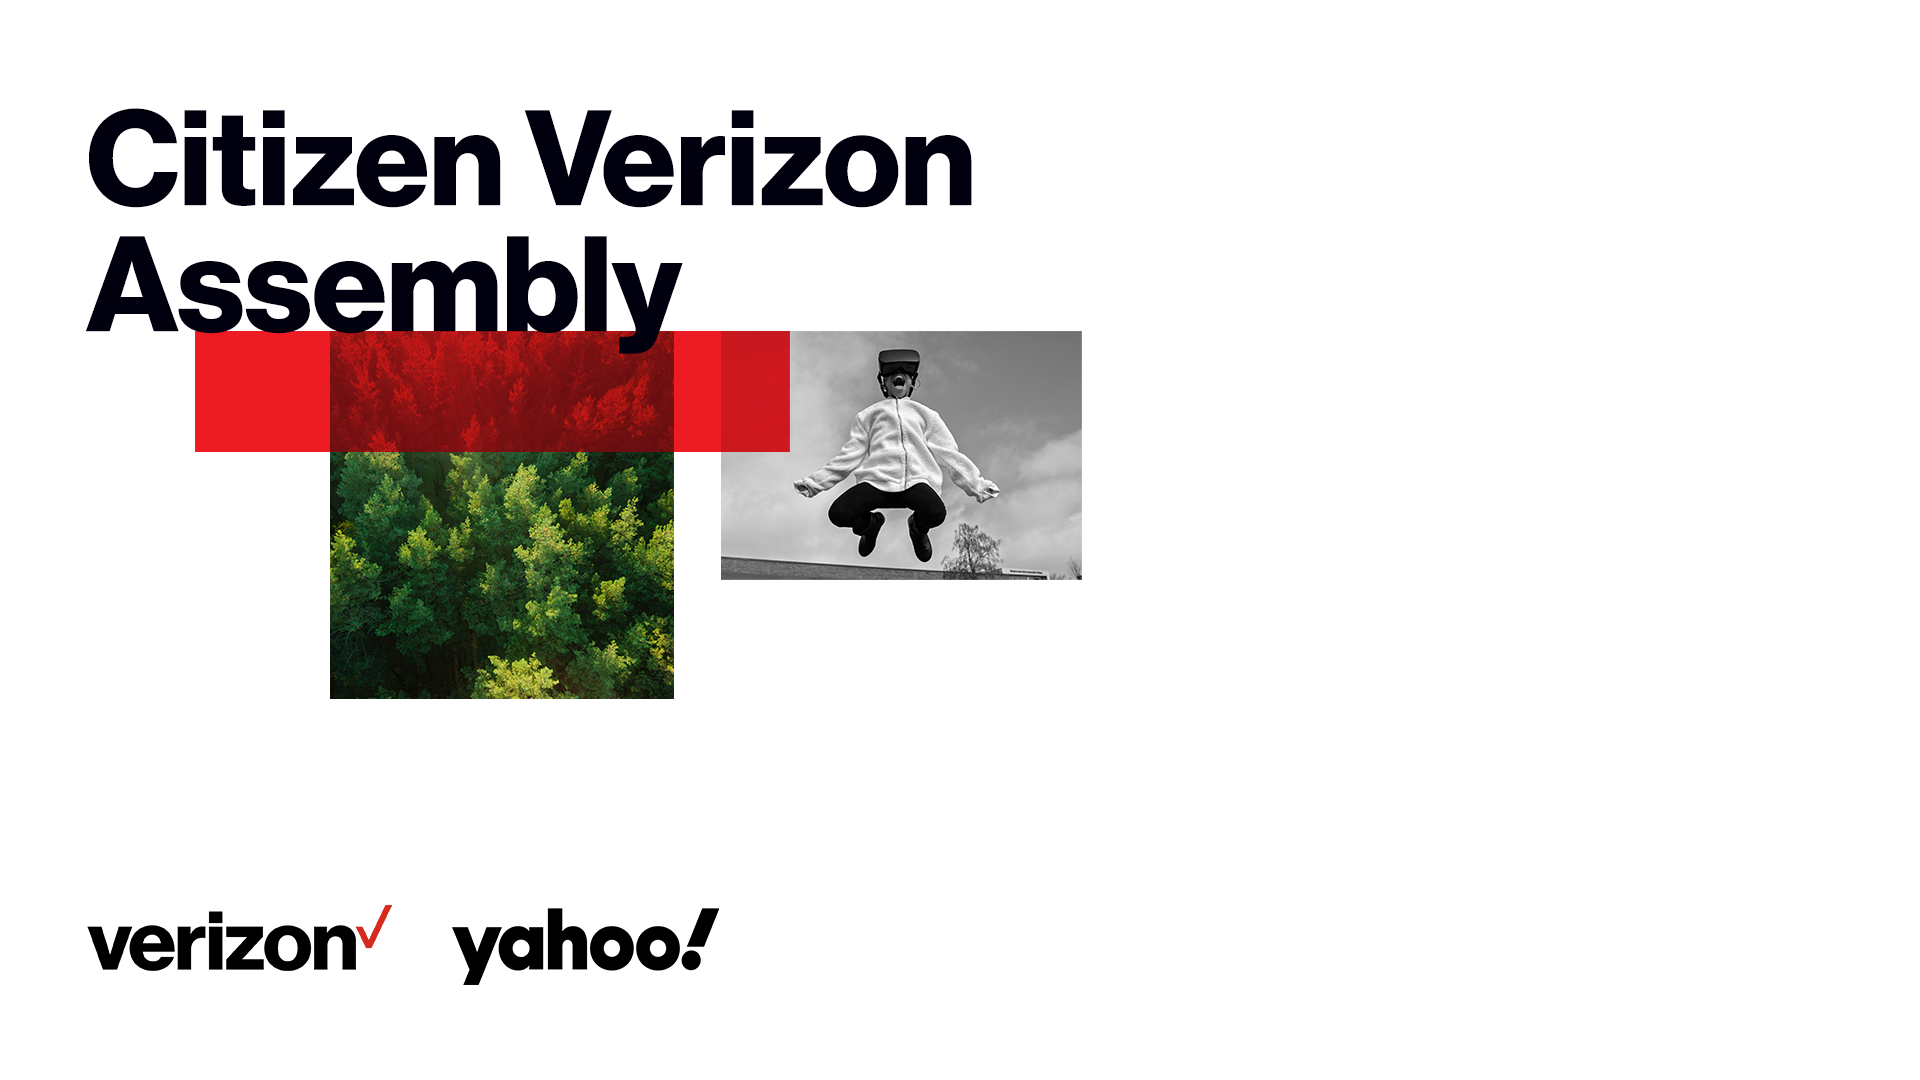 Yara Shahidi, Andrew Yang, Karamo Brown, CEOs and Nonprofit Leaders Convene for Citizen Verizon Assembly Addressing Responsible Business and Creating Social Change